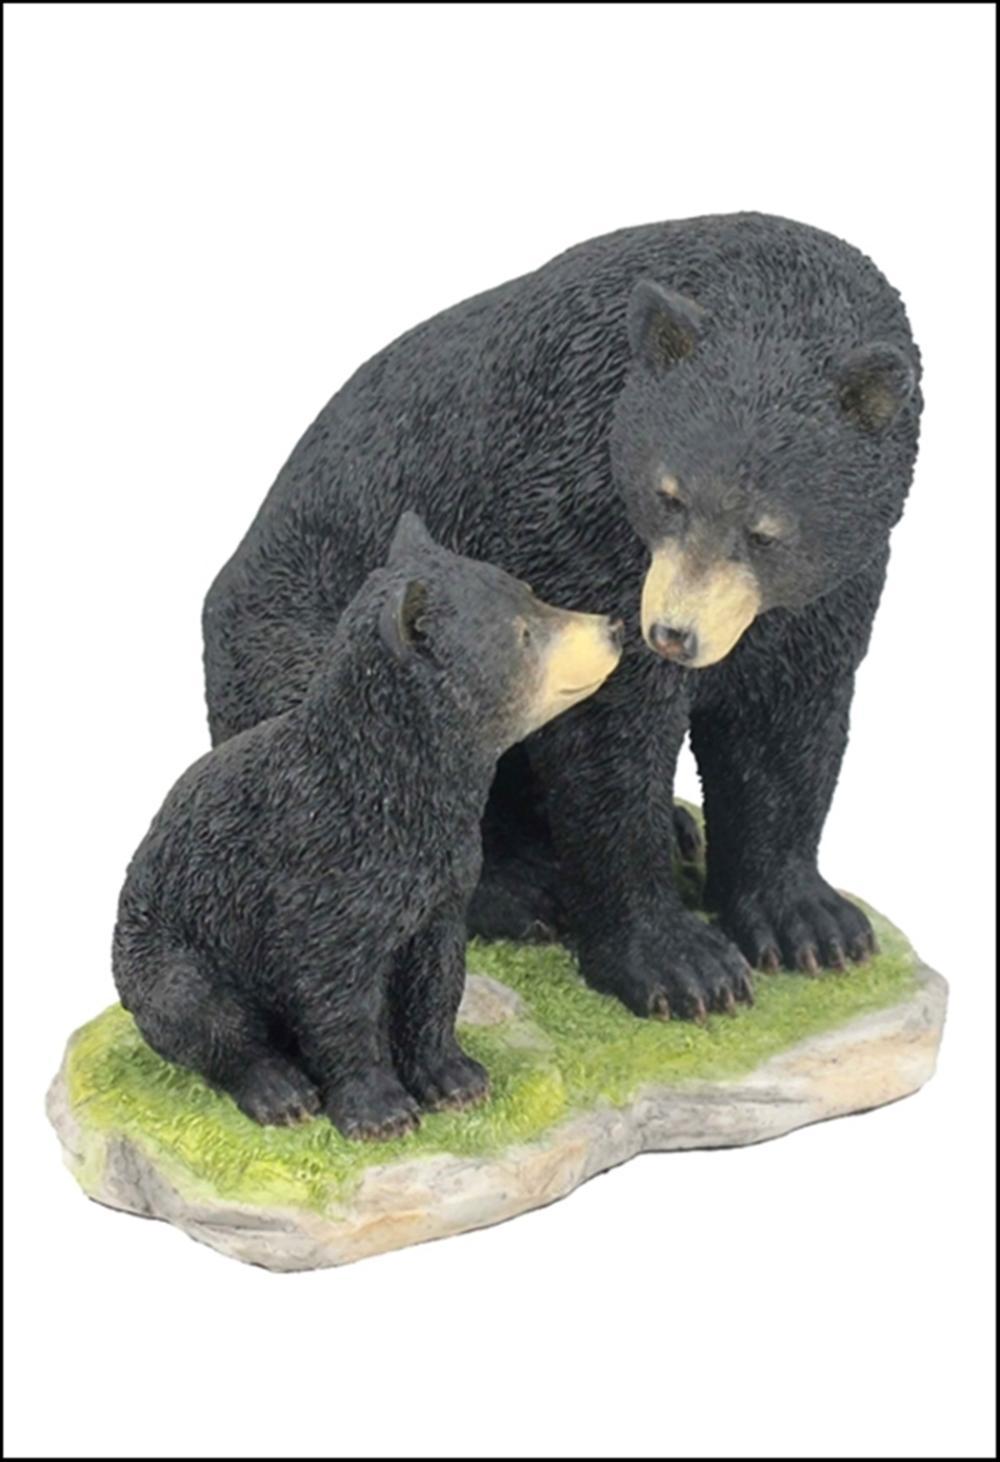 BLACK BEAR SITTING WITH HER CUB